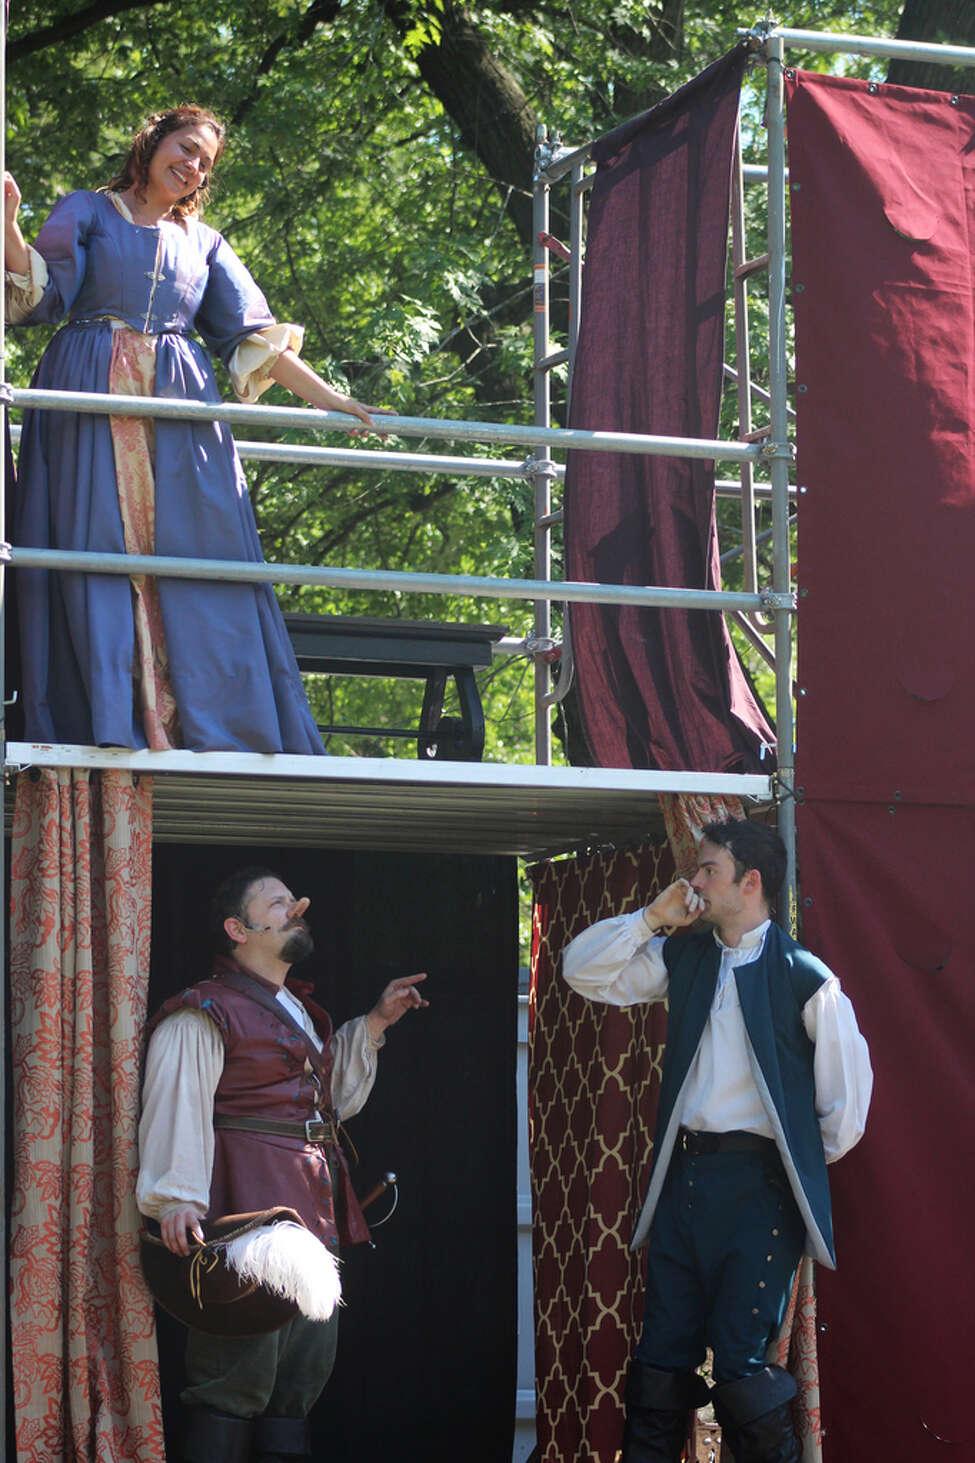 A scene from Saratoga Shakespeare Company's 2016 production of